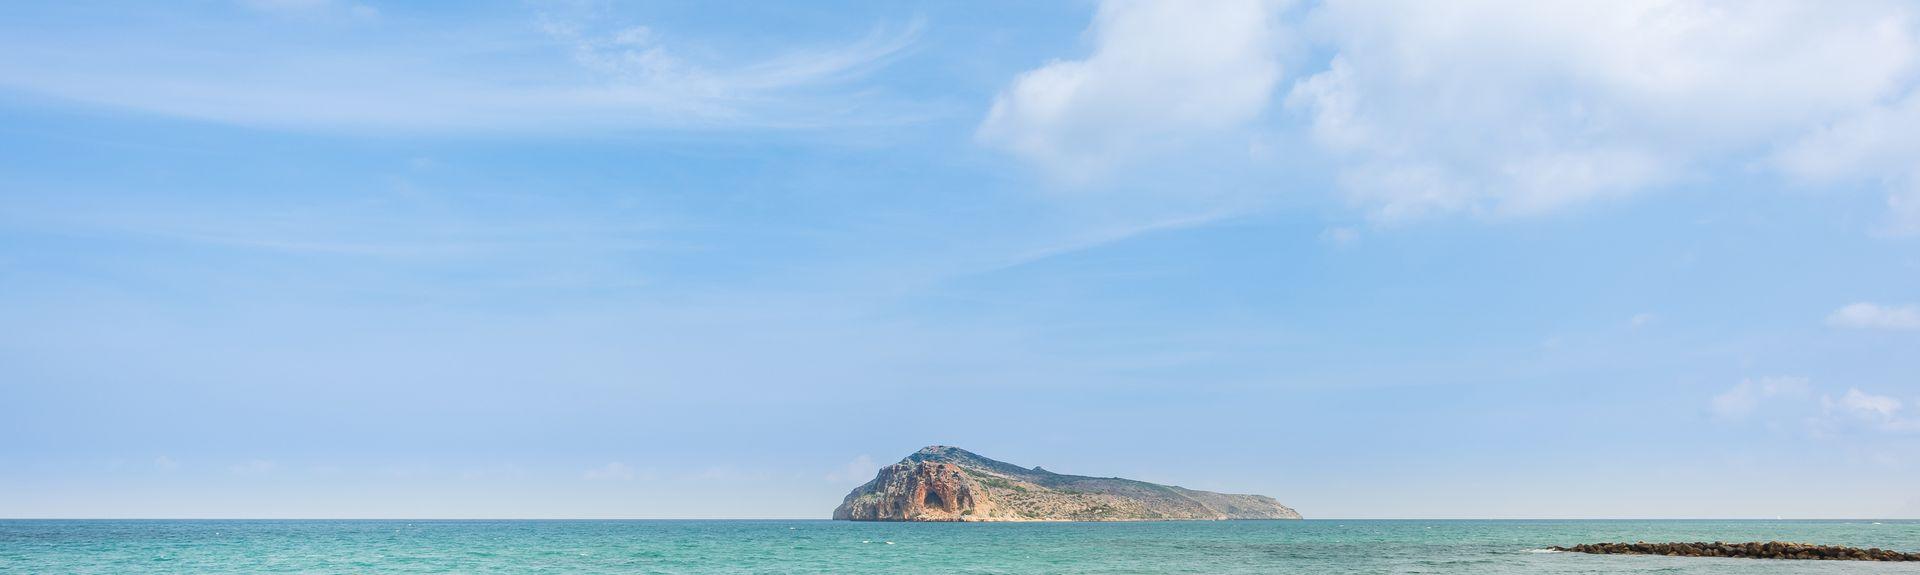 Voukoliai, Platanias, Kreta, Griechenland